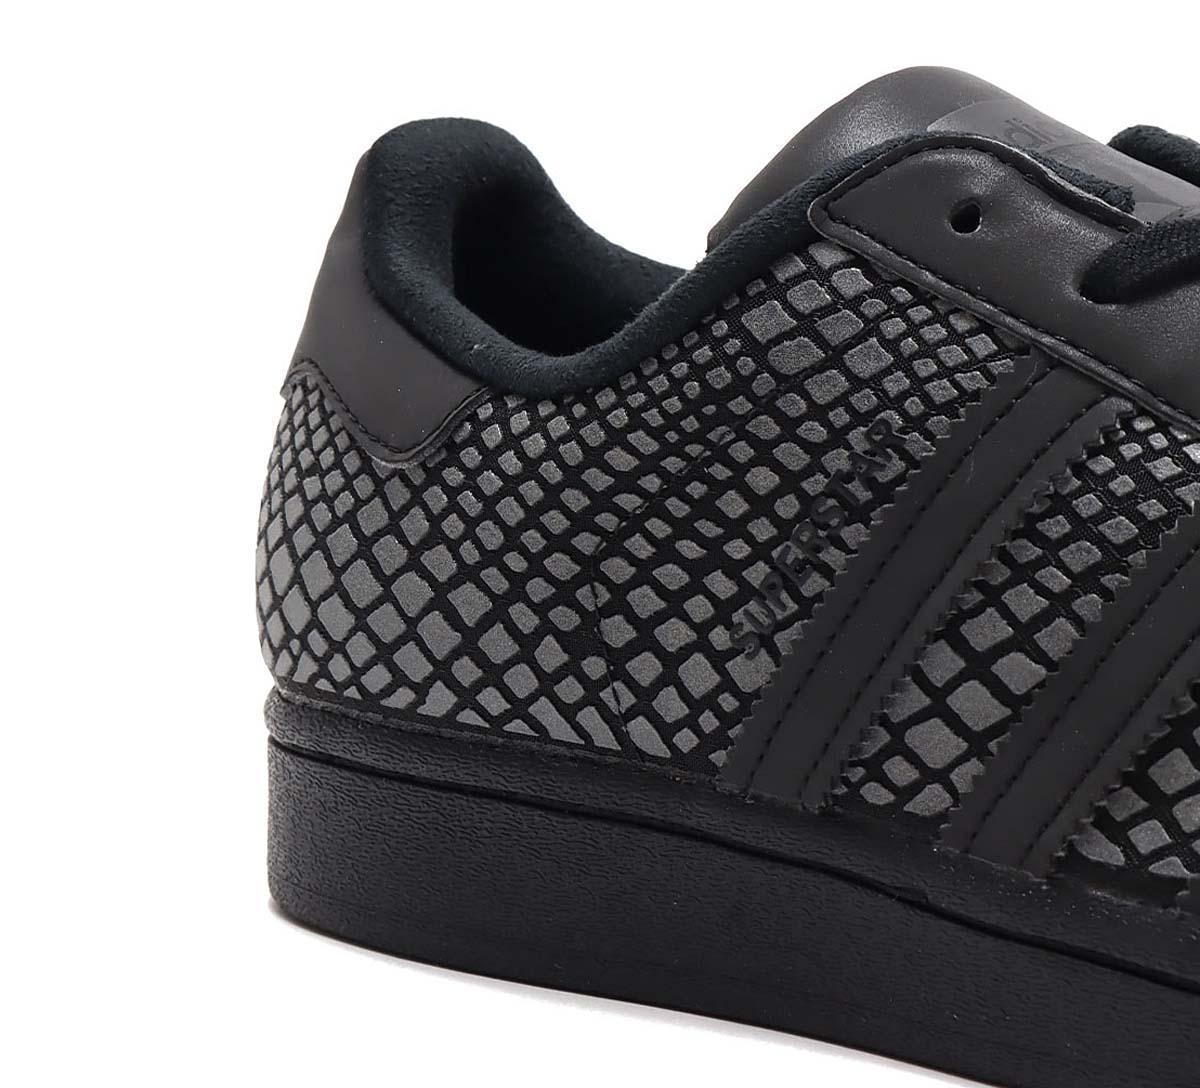 atmos x adidas SUPERSTAR R-SNK CORE BLACK / CORE BLACK / GRAY SIX FY6014 アトモス × アディダス スーパースター R-SNK ブラック/グレー/リフレクター